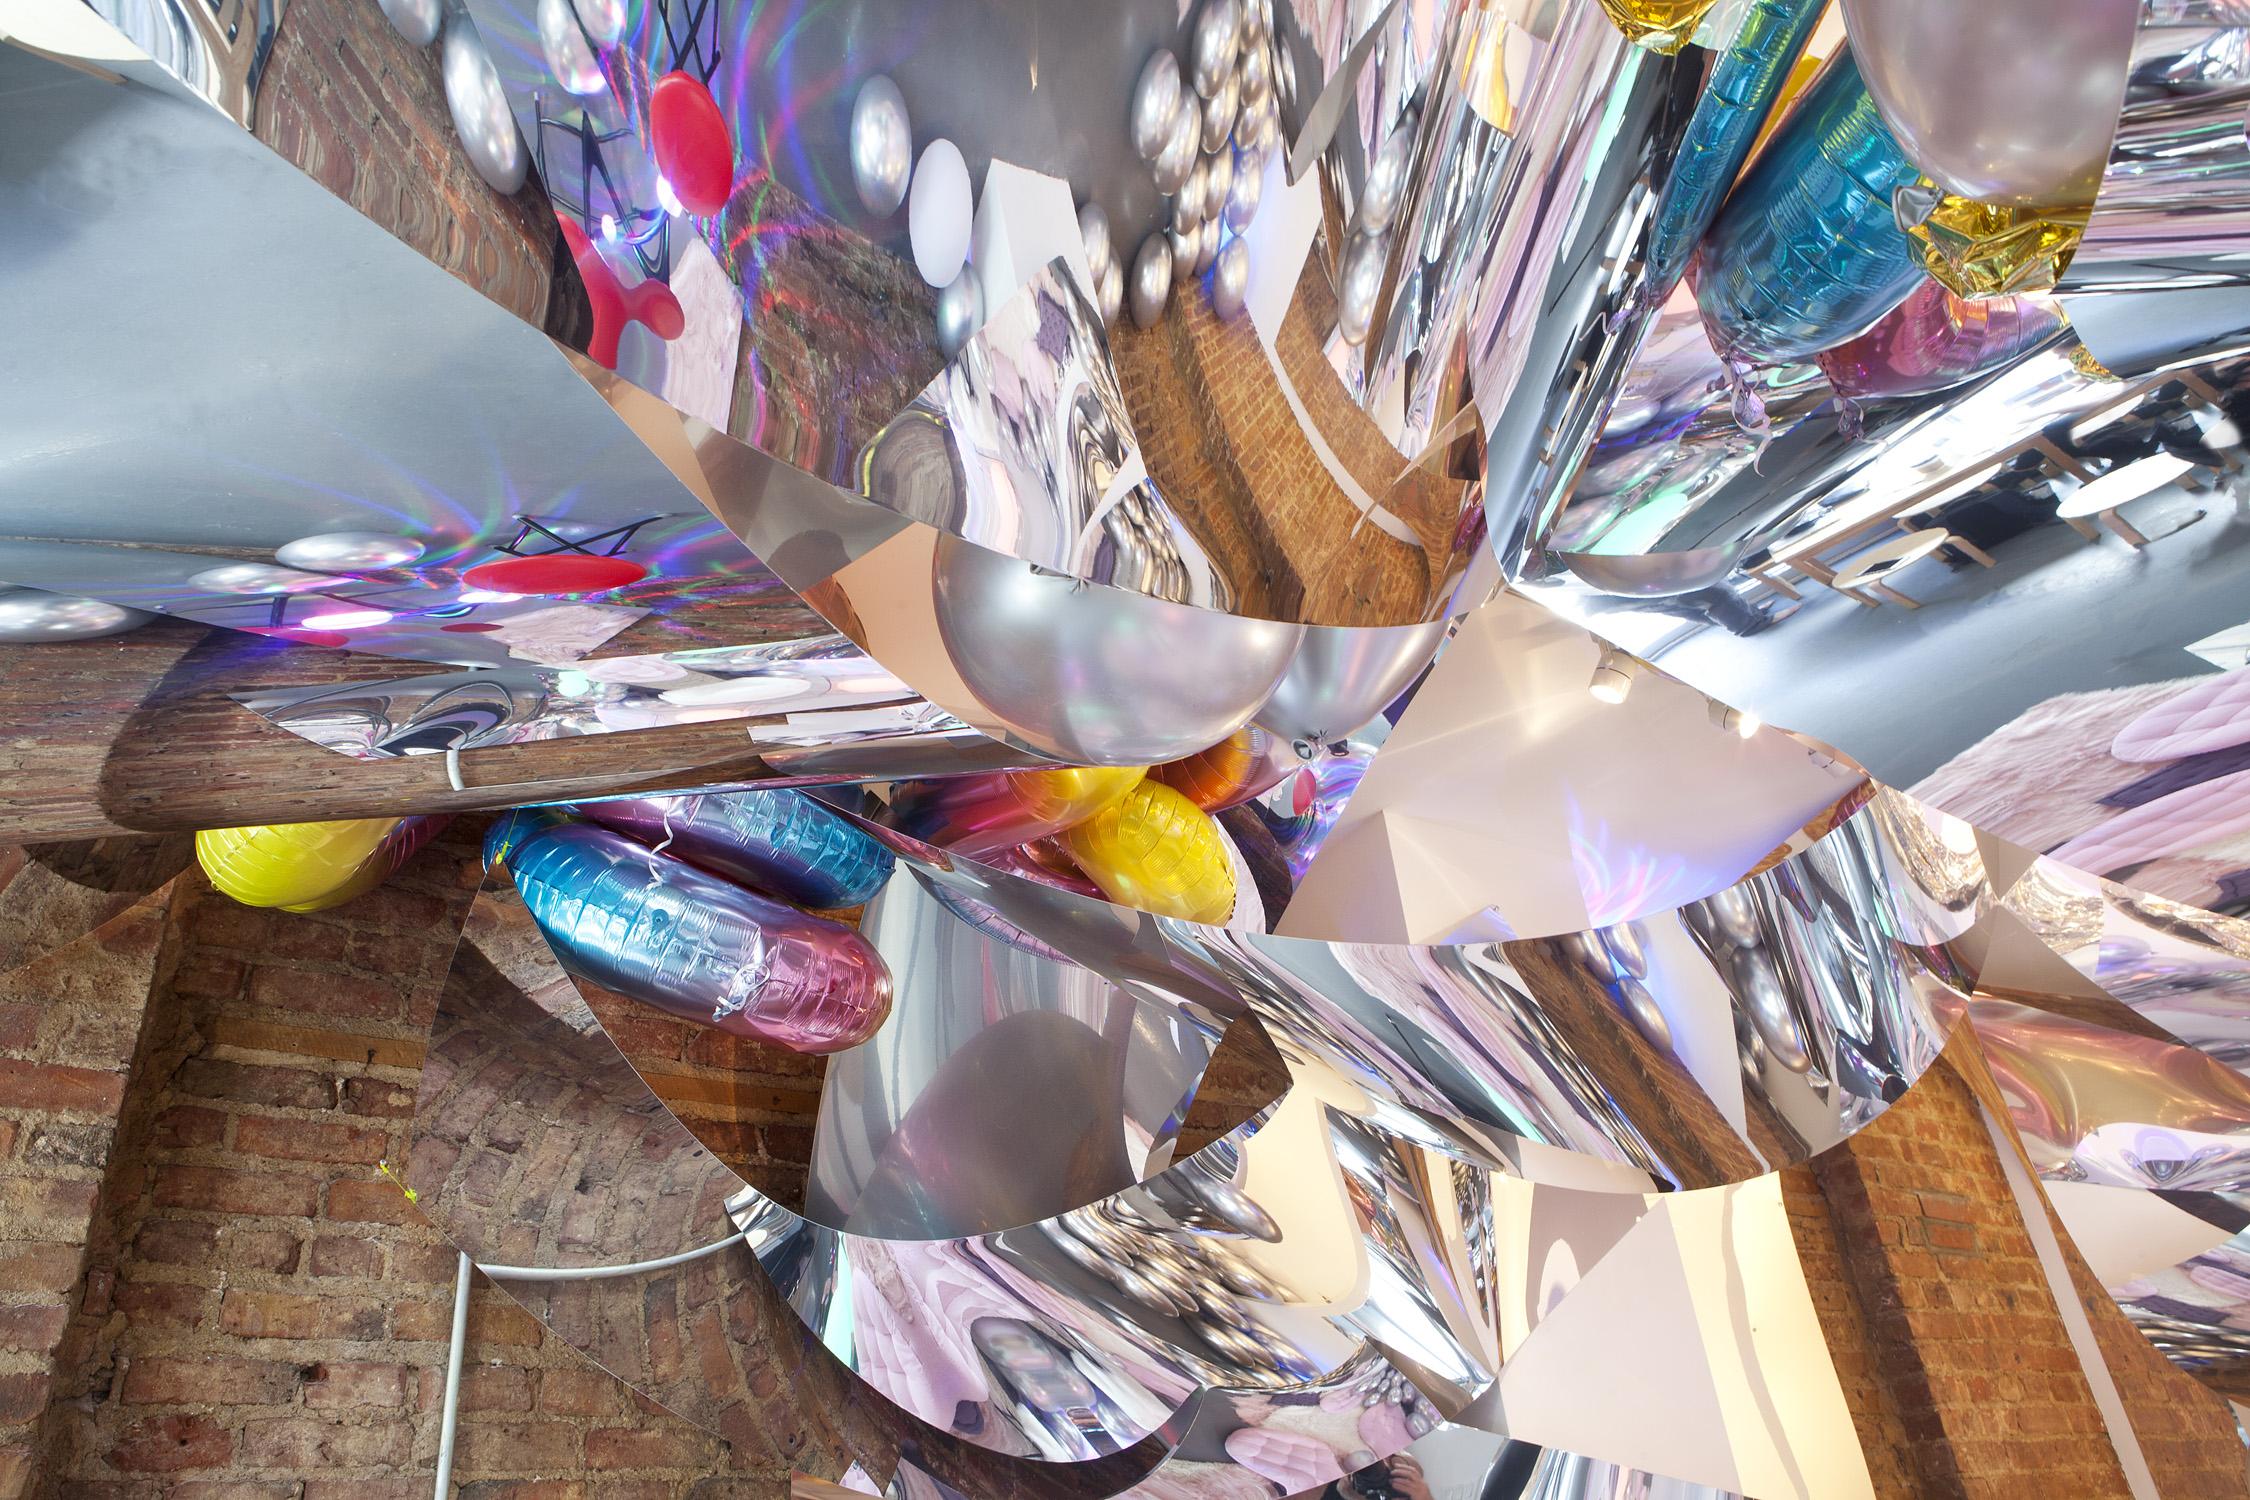 Sharon Louden & Hrag Vartanian,  Origins , Exhibition View, 9.04.19 - 10.11.19. Photo: Christopher Gallo.